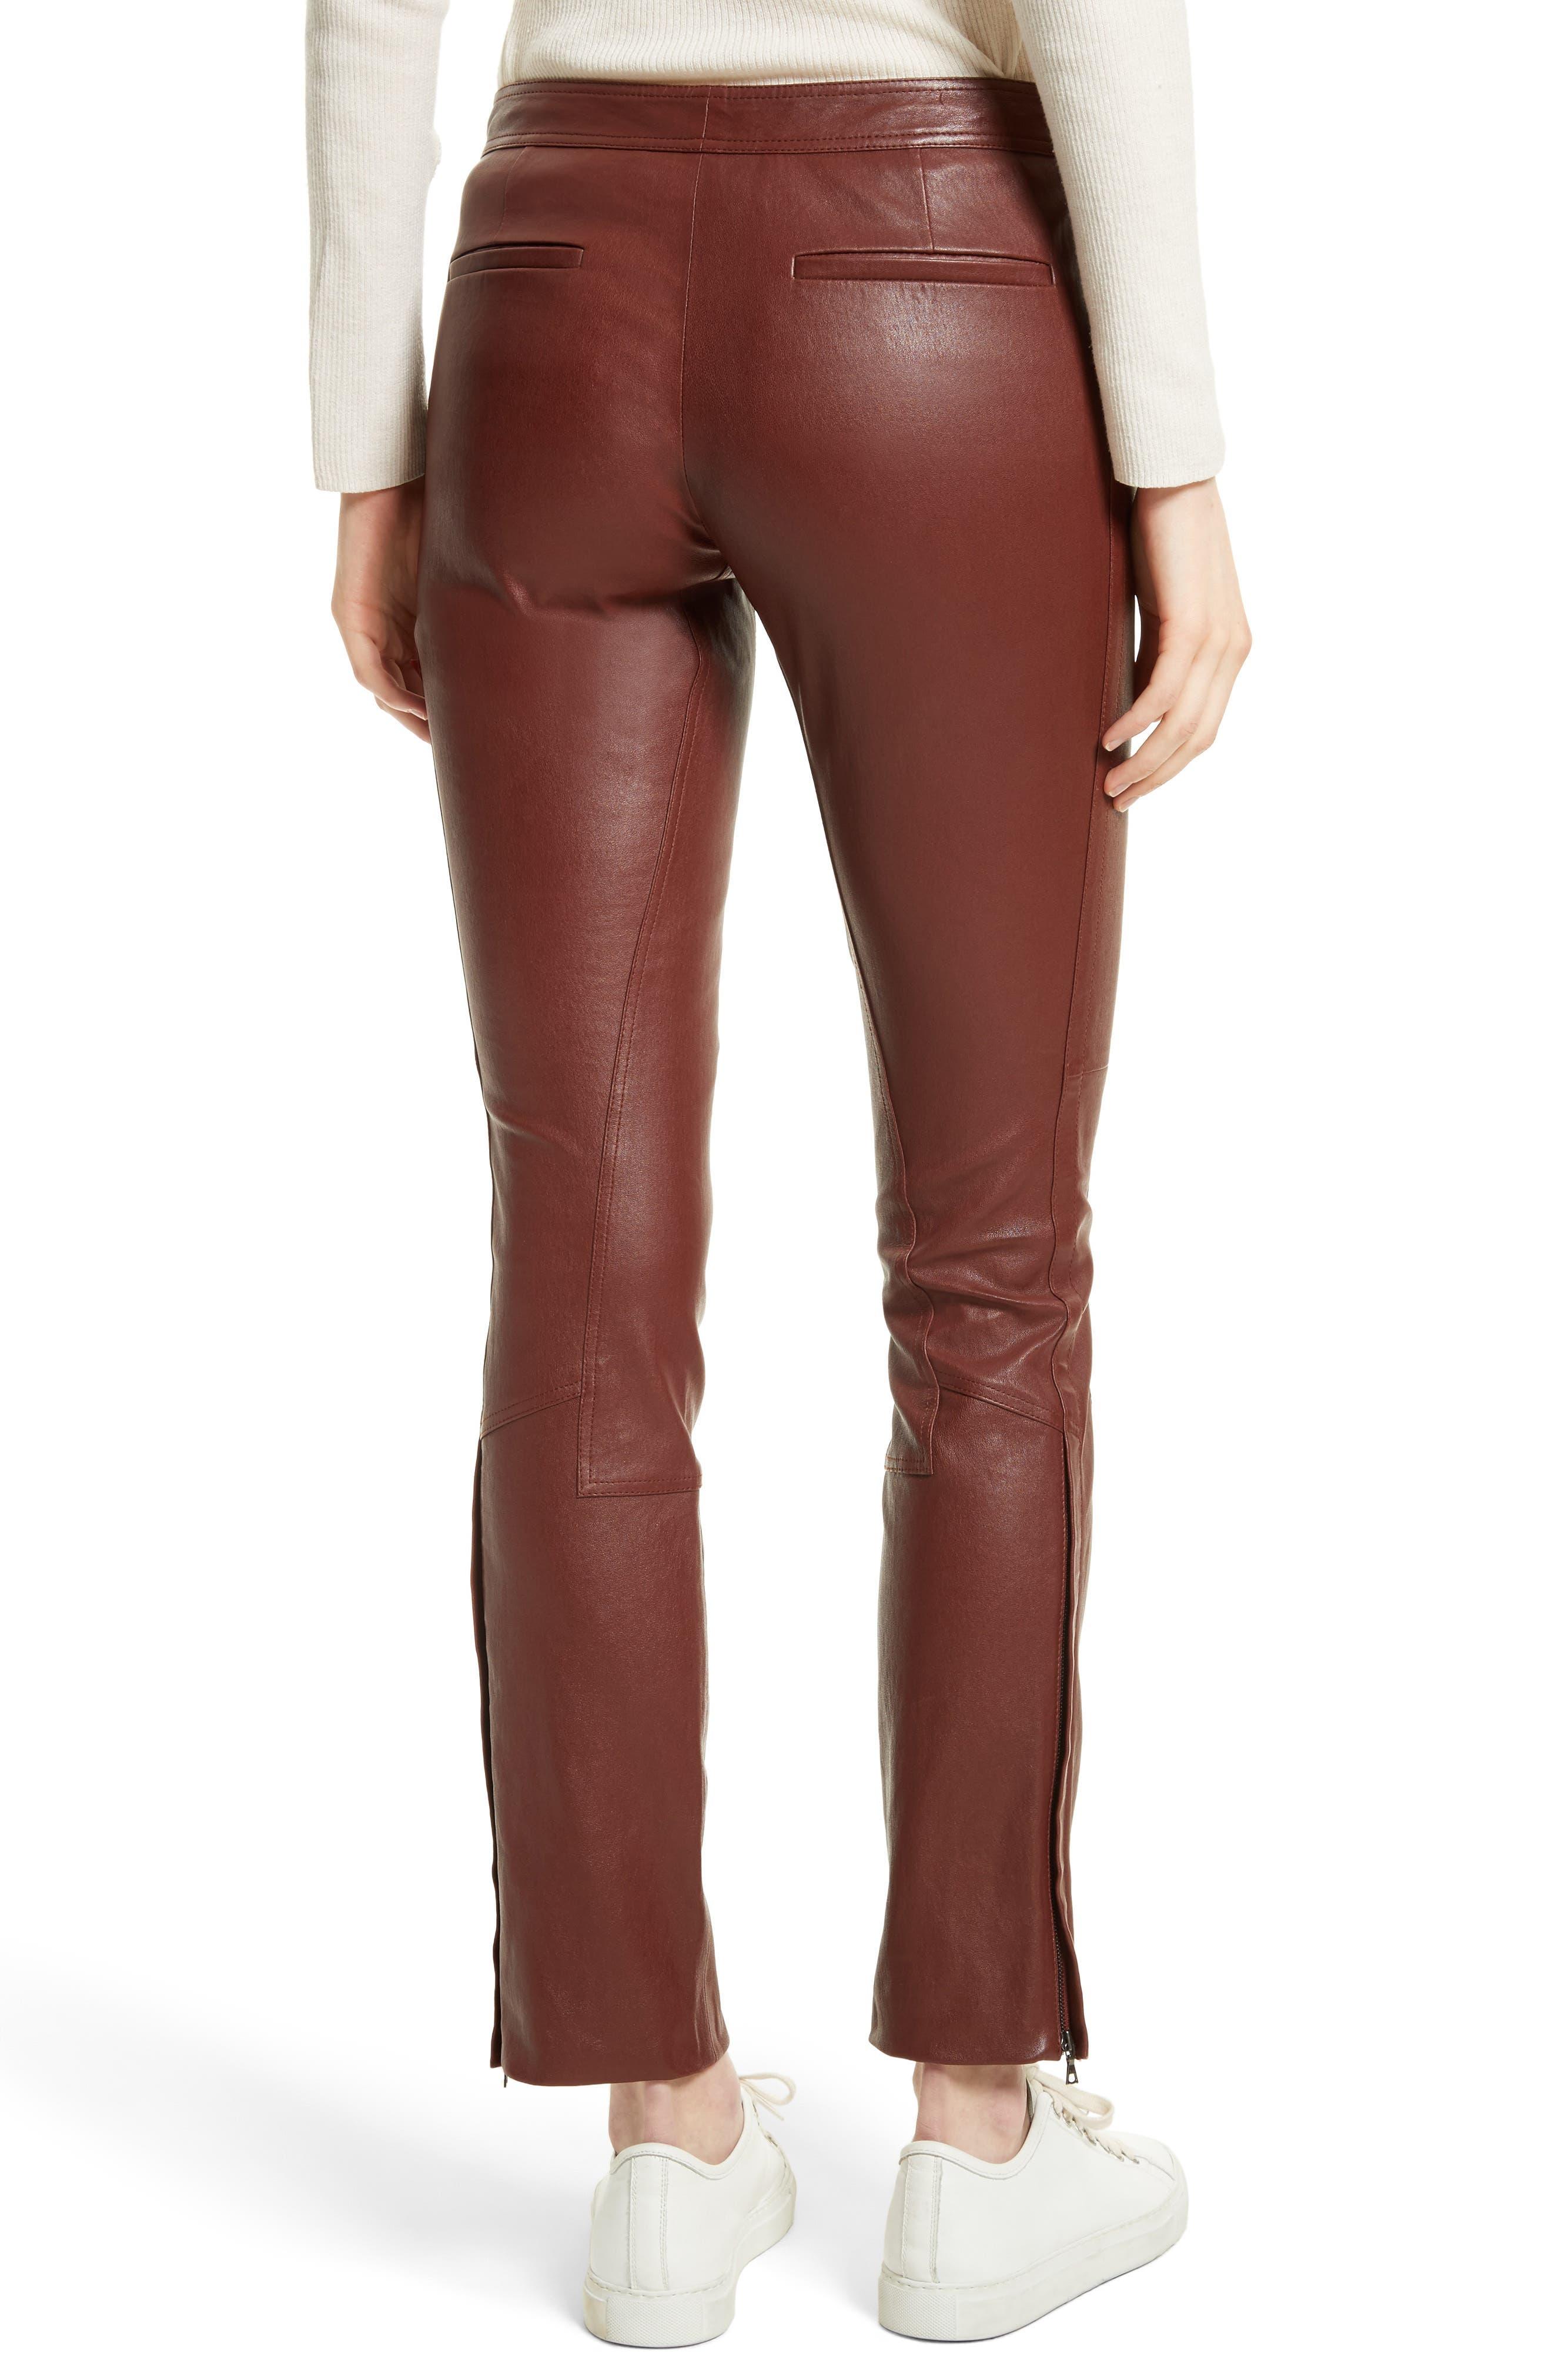 Bristol Leather Riding Pants,                             Alternate thumbnail 2, color,                             215